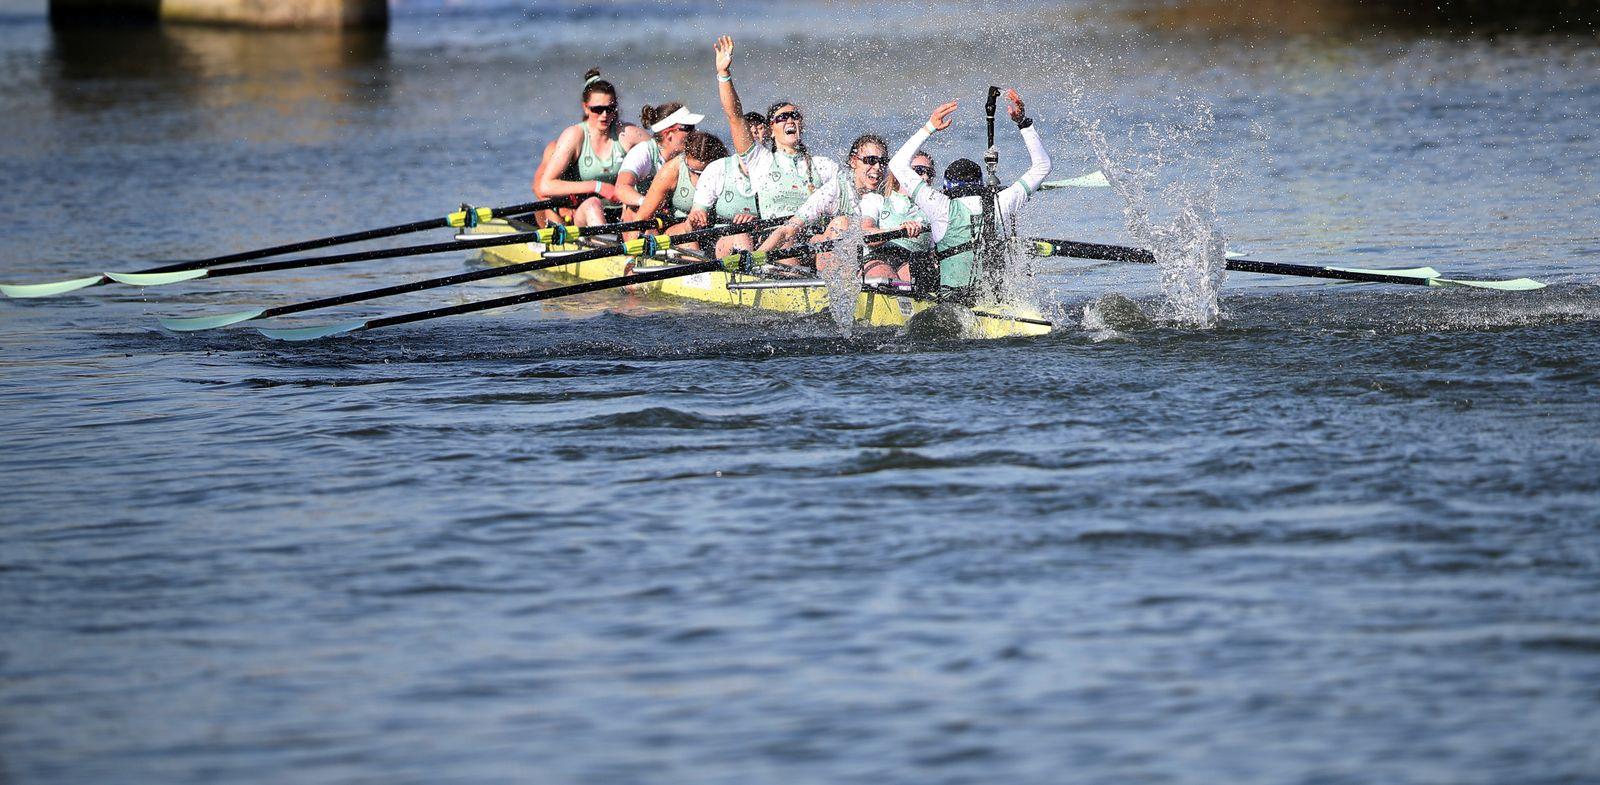 2021 Oxford v Cambridge - University Boat Race